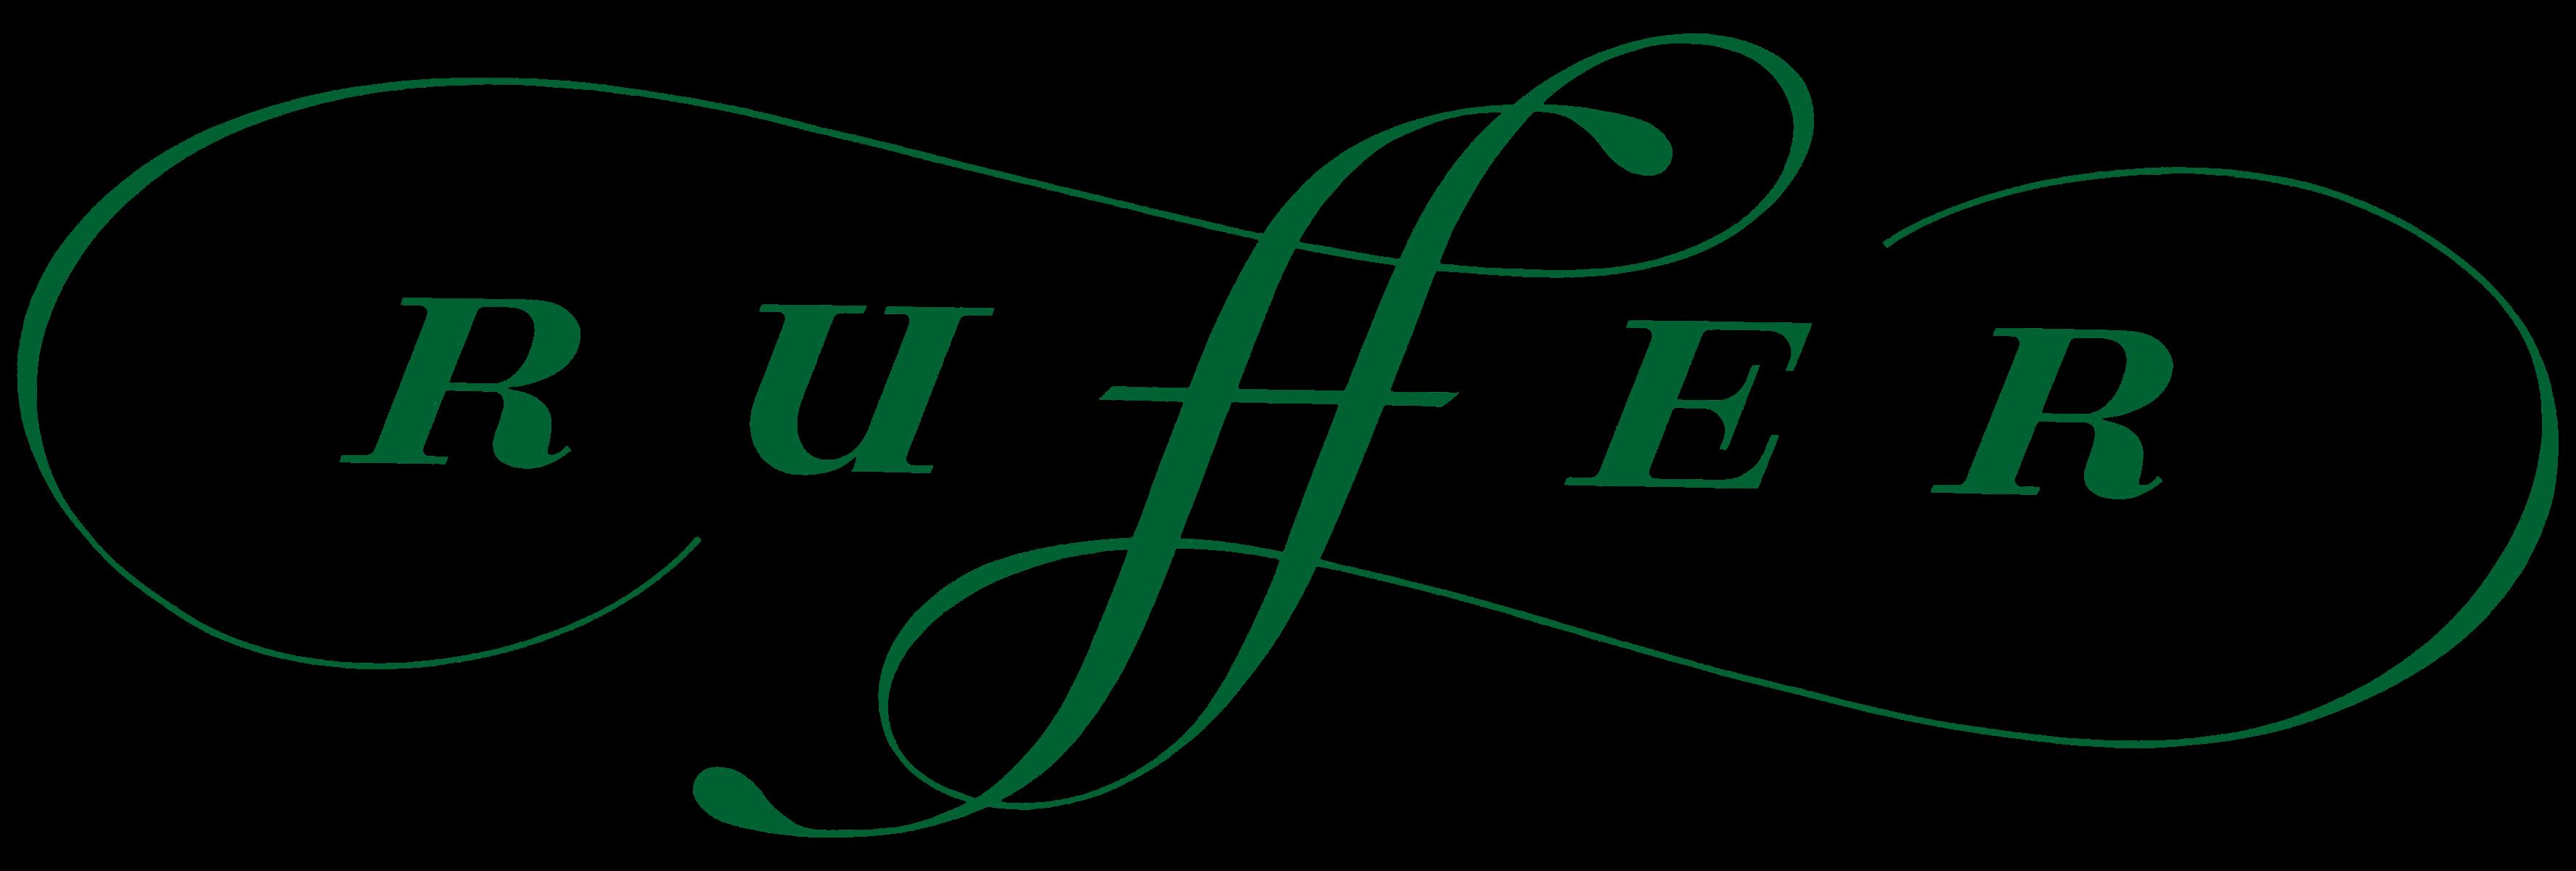 RUFFER INVESTMENT COMPANY LTD Logo